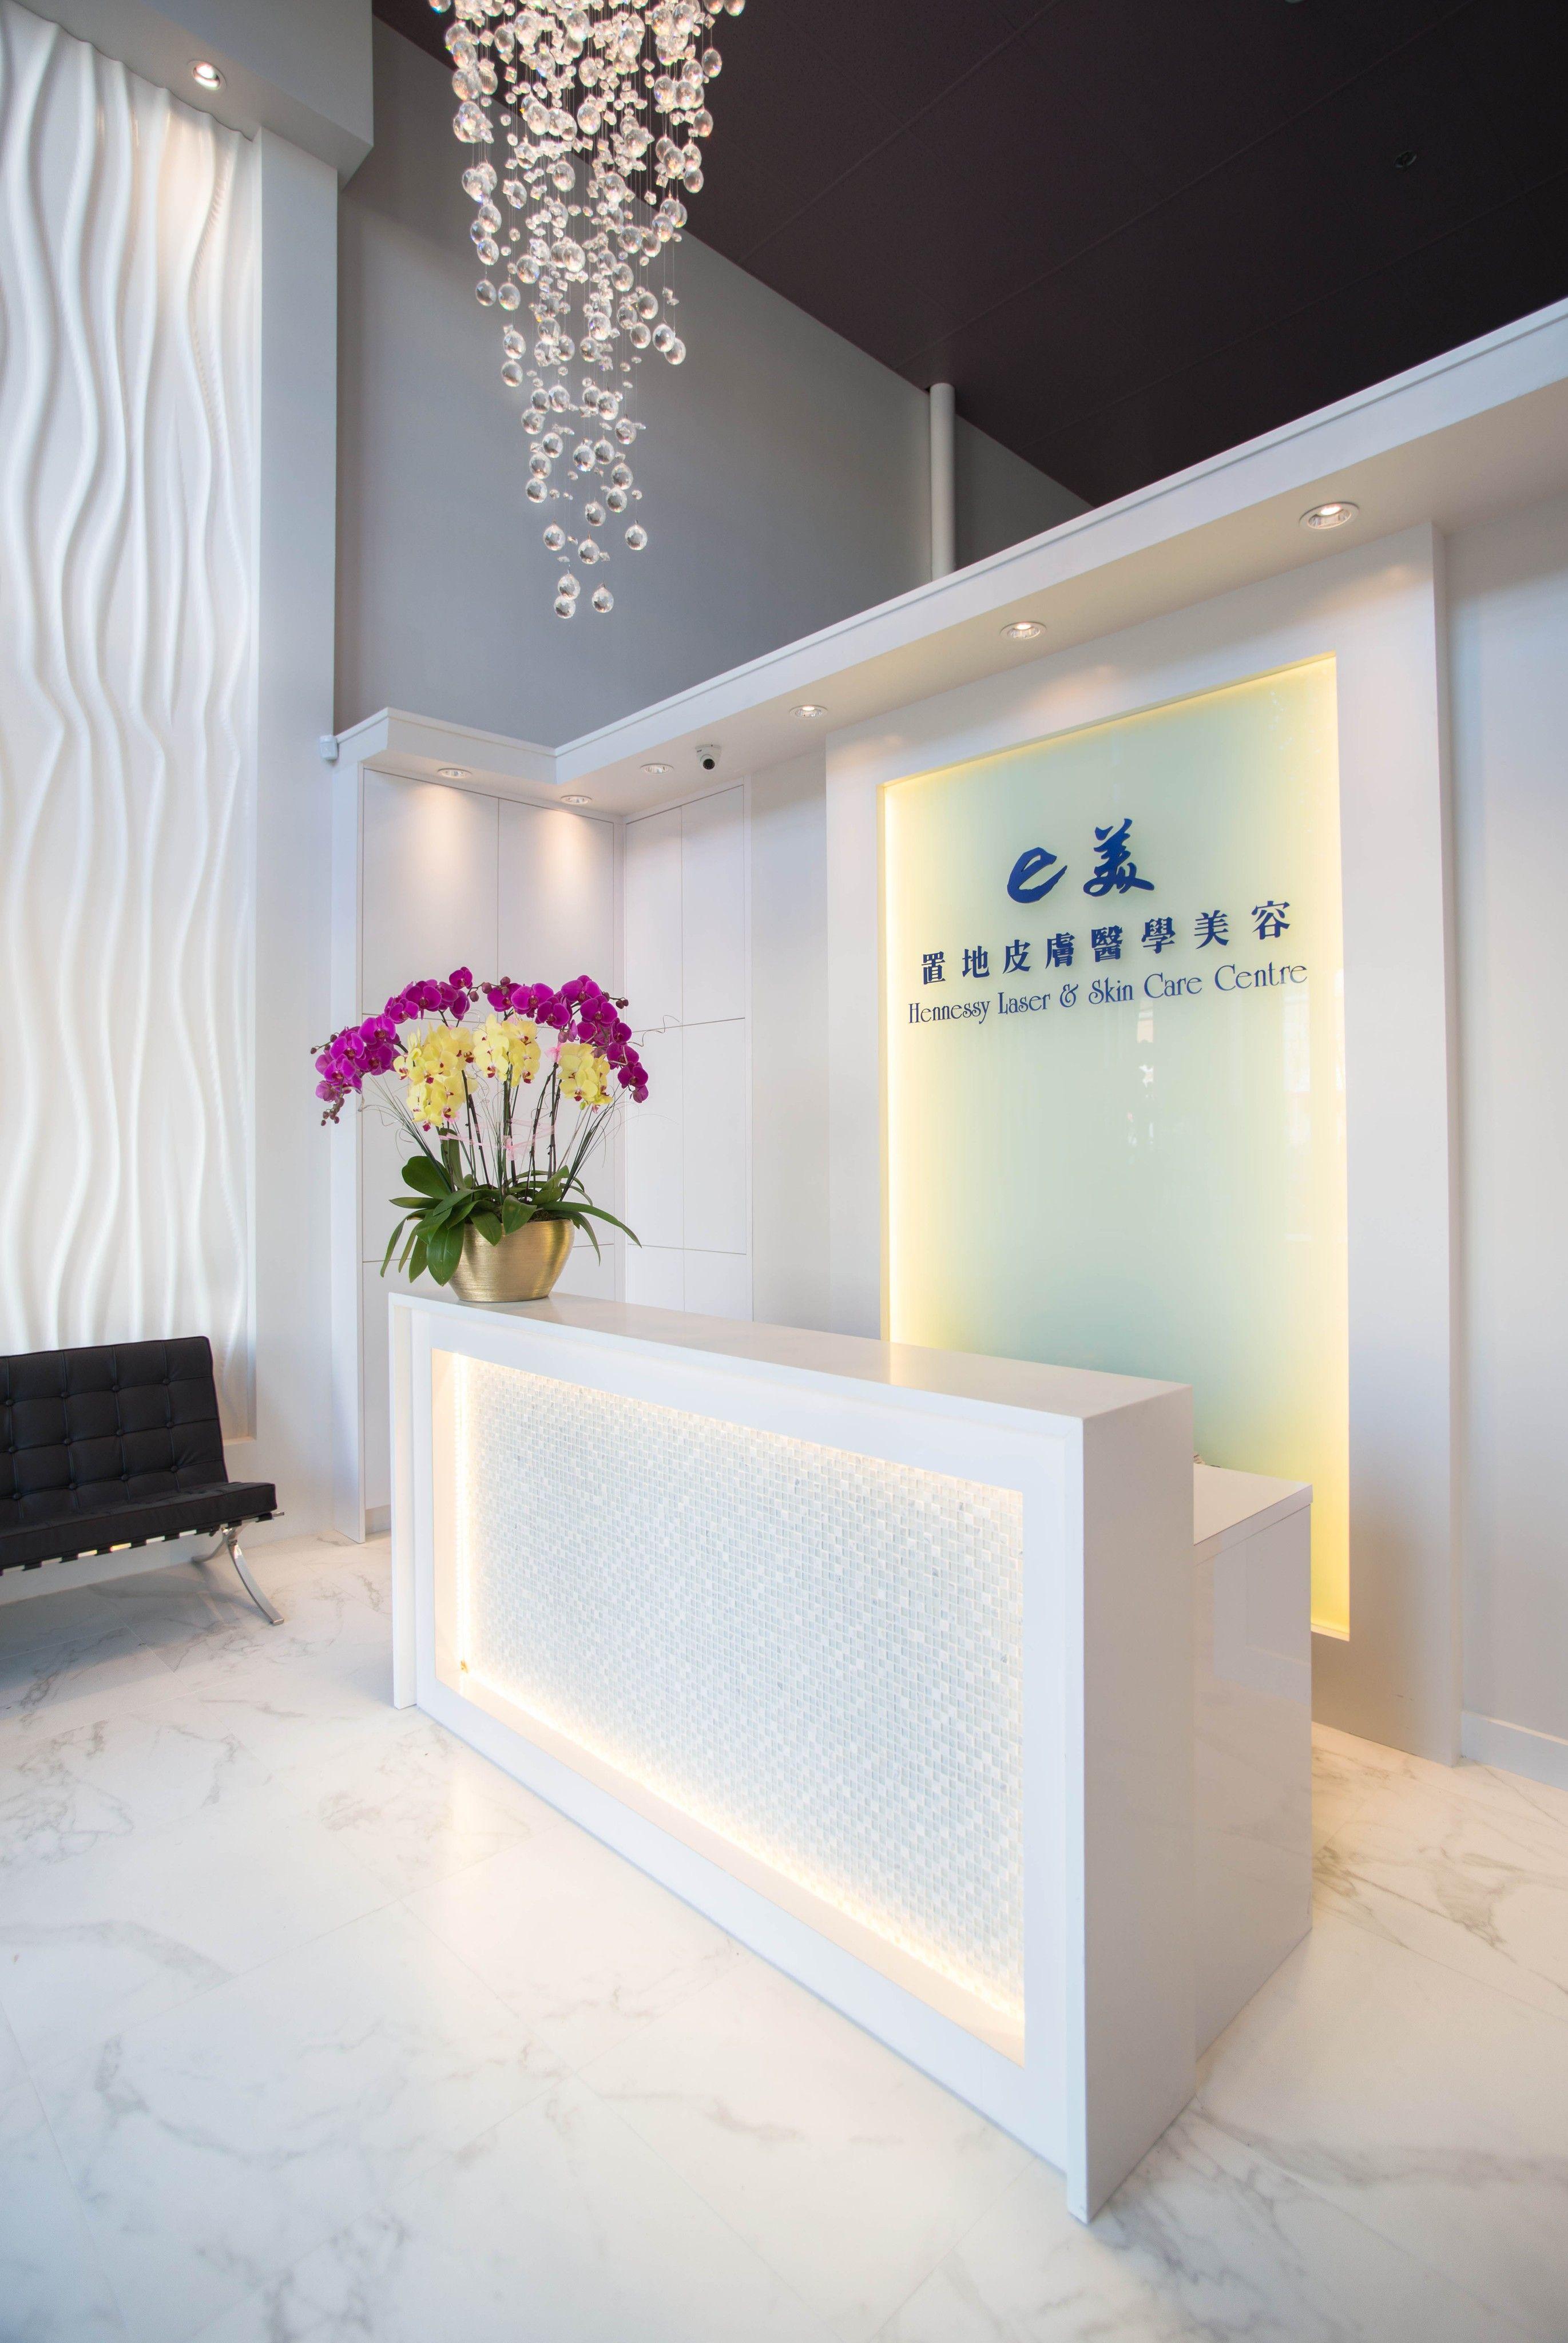 richmond laser skin care center